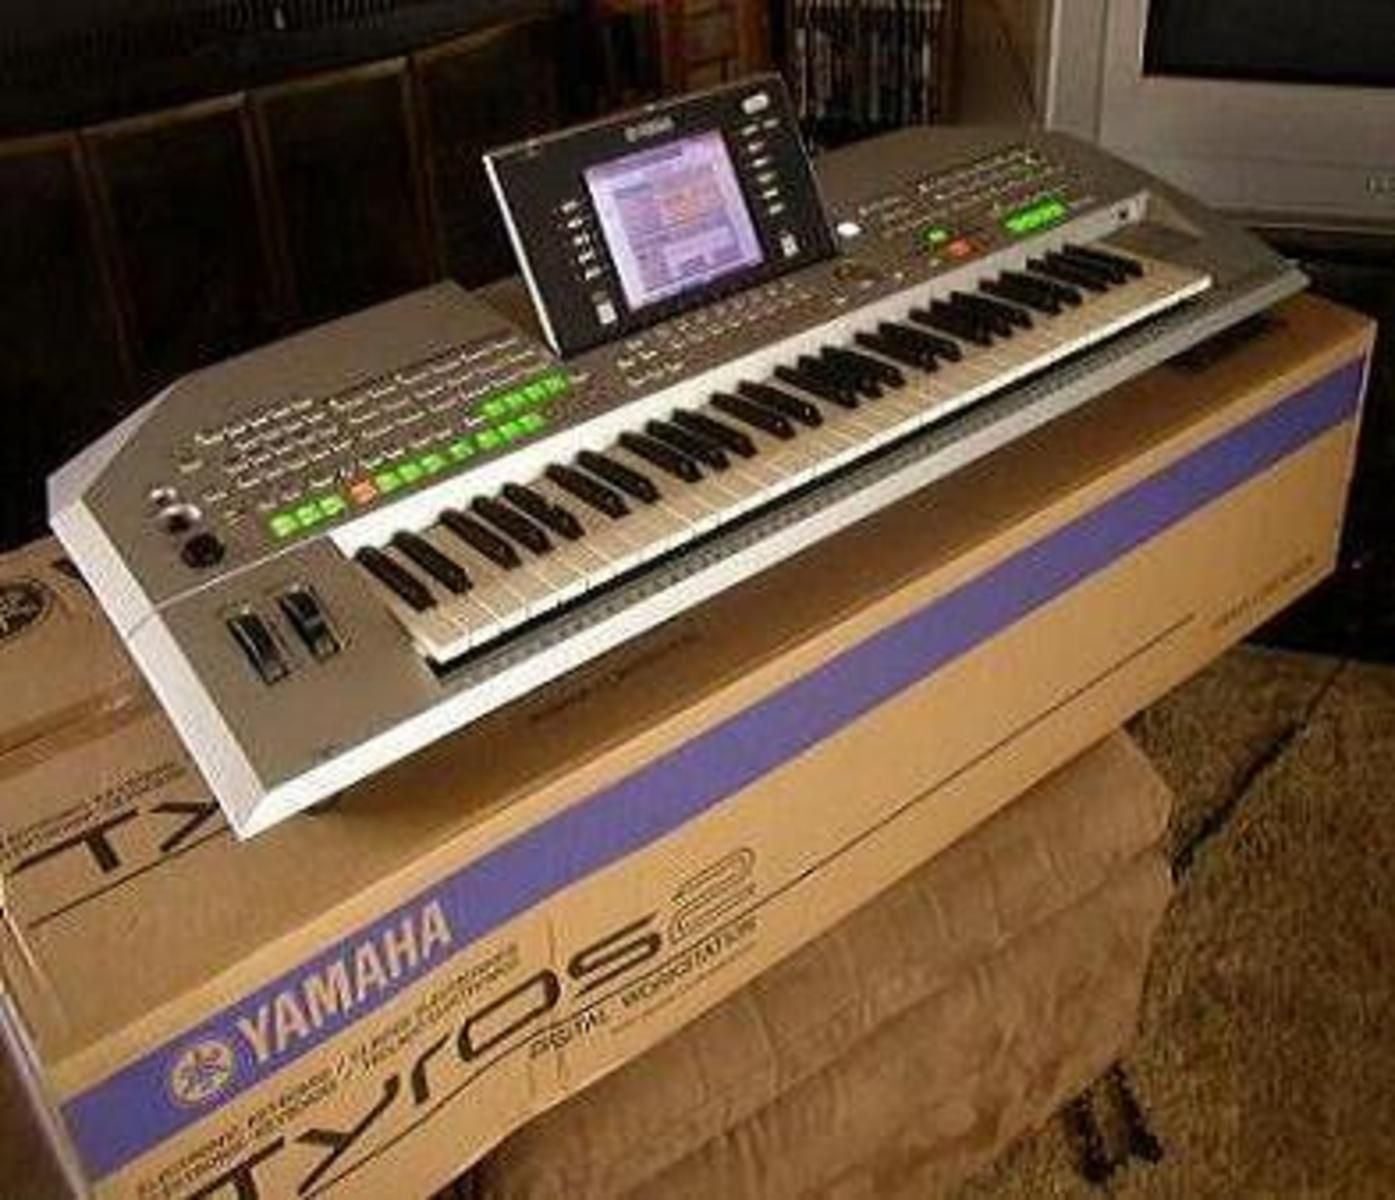 photo yamaha tyros 2 keyboards home studio yamaha tyros 2 piano keyboard sinth 41126. Black Bedroom Furniture Sets. Home Design Ideas